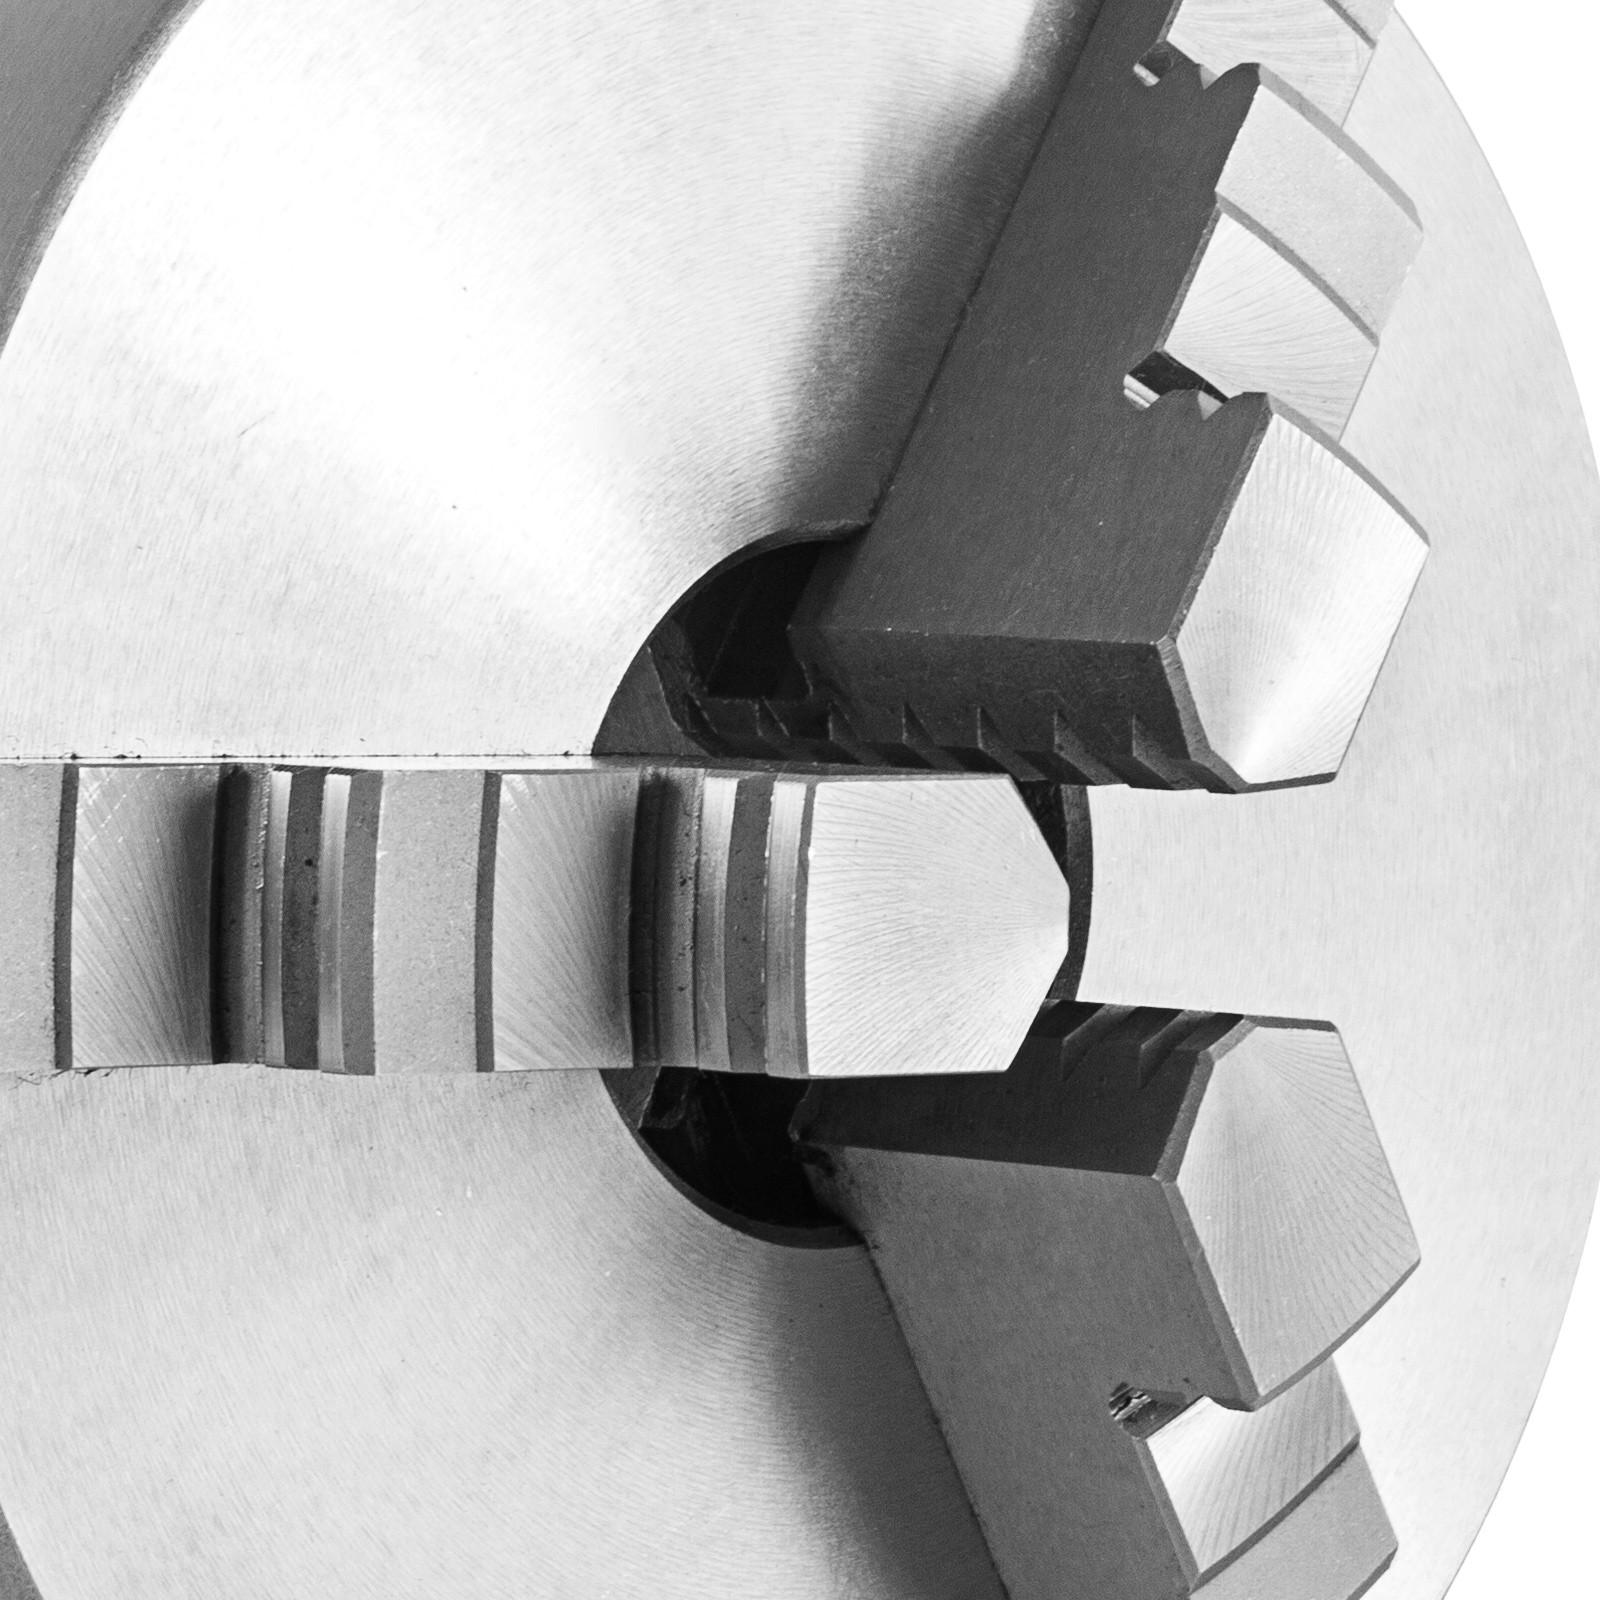 K11-130 130mm 3 Jaw Self Centering Lathe Chuck Semi-steel 5 Inch Internal Jaw